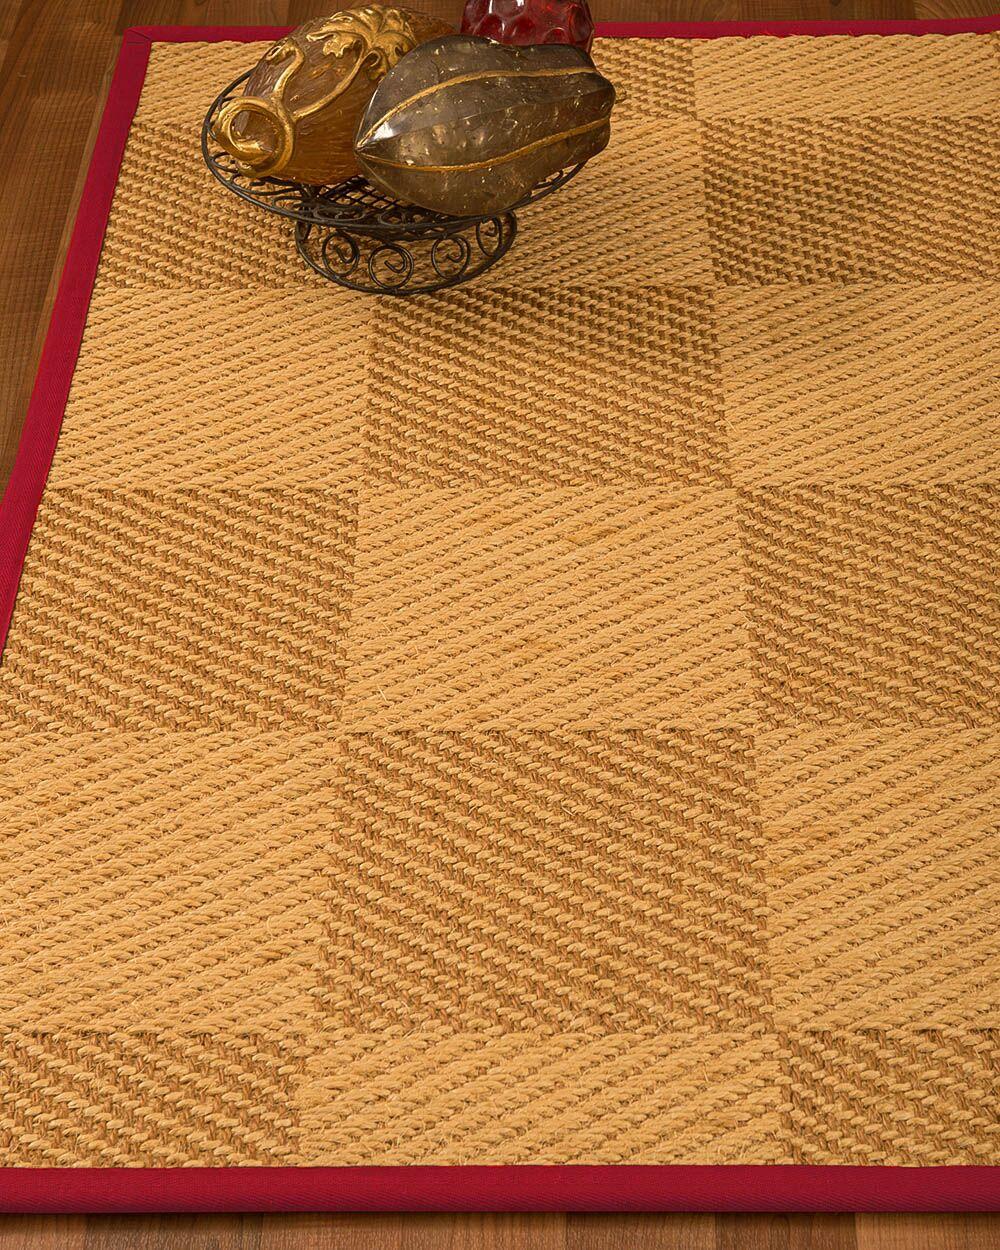 Luhrmann Hand Woven Jute/Sisal Beige/Brown Area Rug Rug Size: Rectangle 2' X 3'